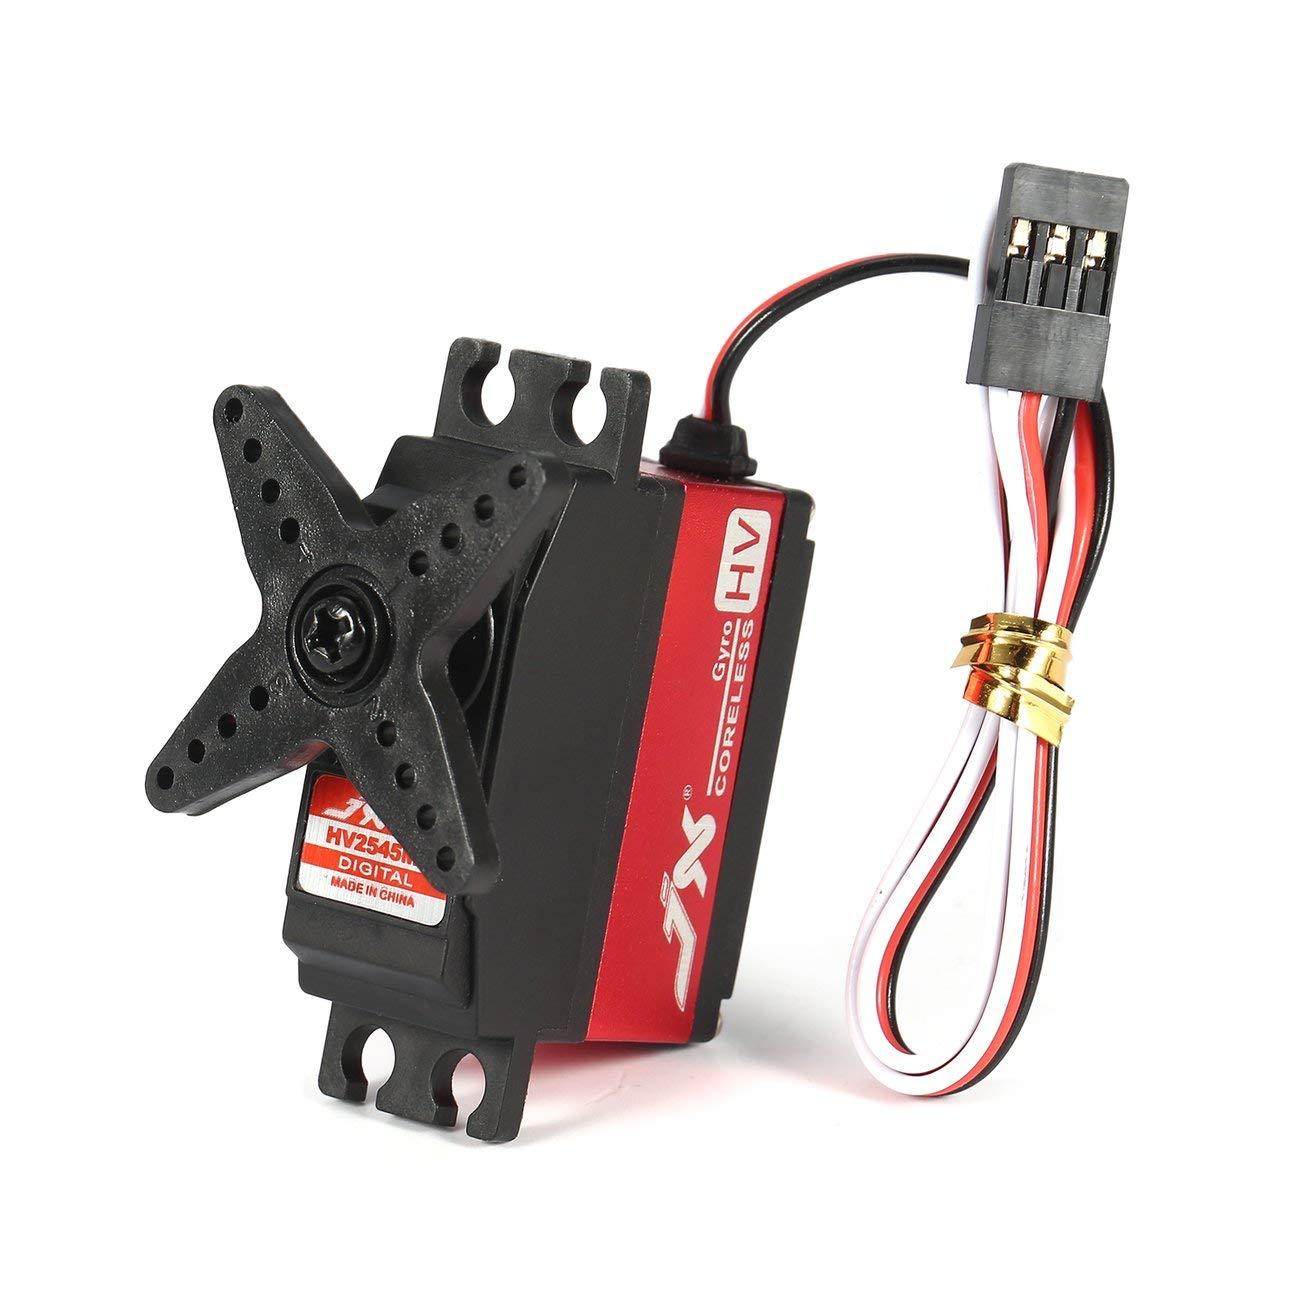 sumicorp.com Ferngesteuerte Modelle & Zubehr Hobbys JX PDI ...